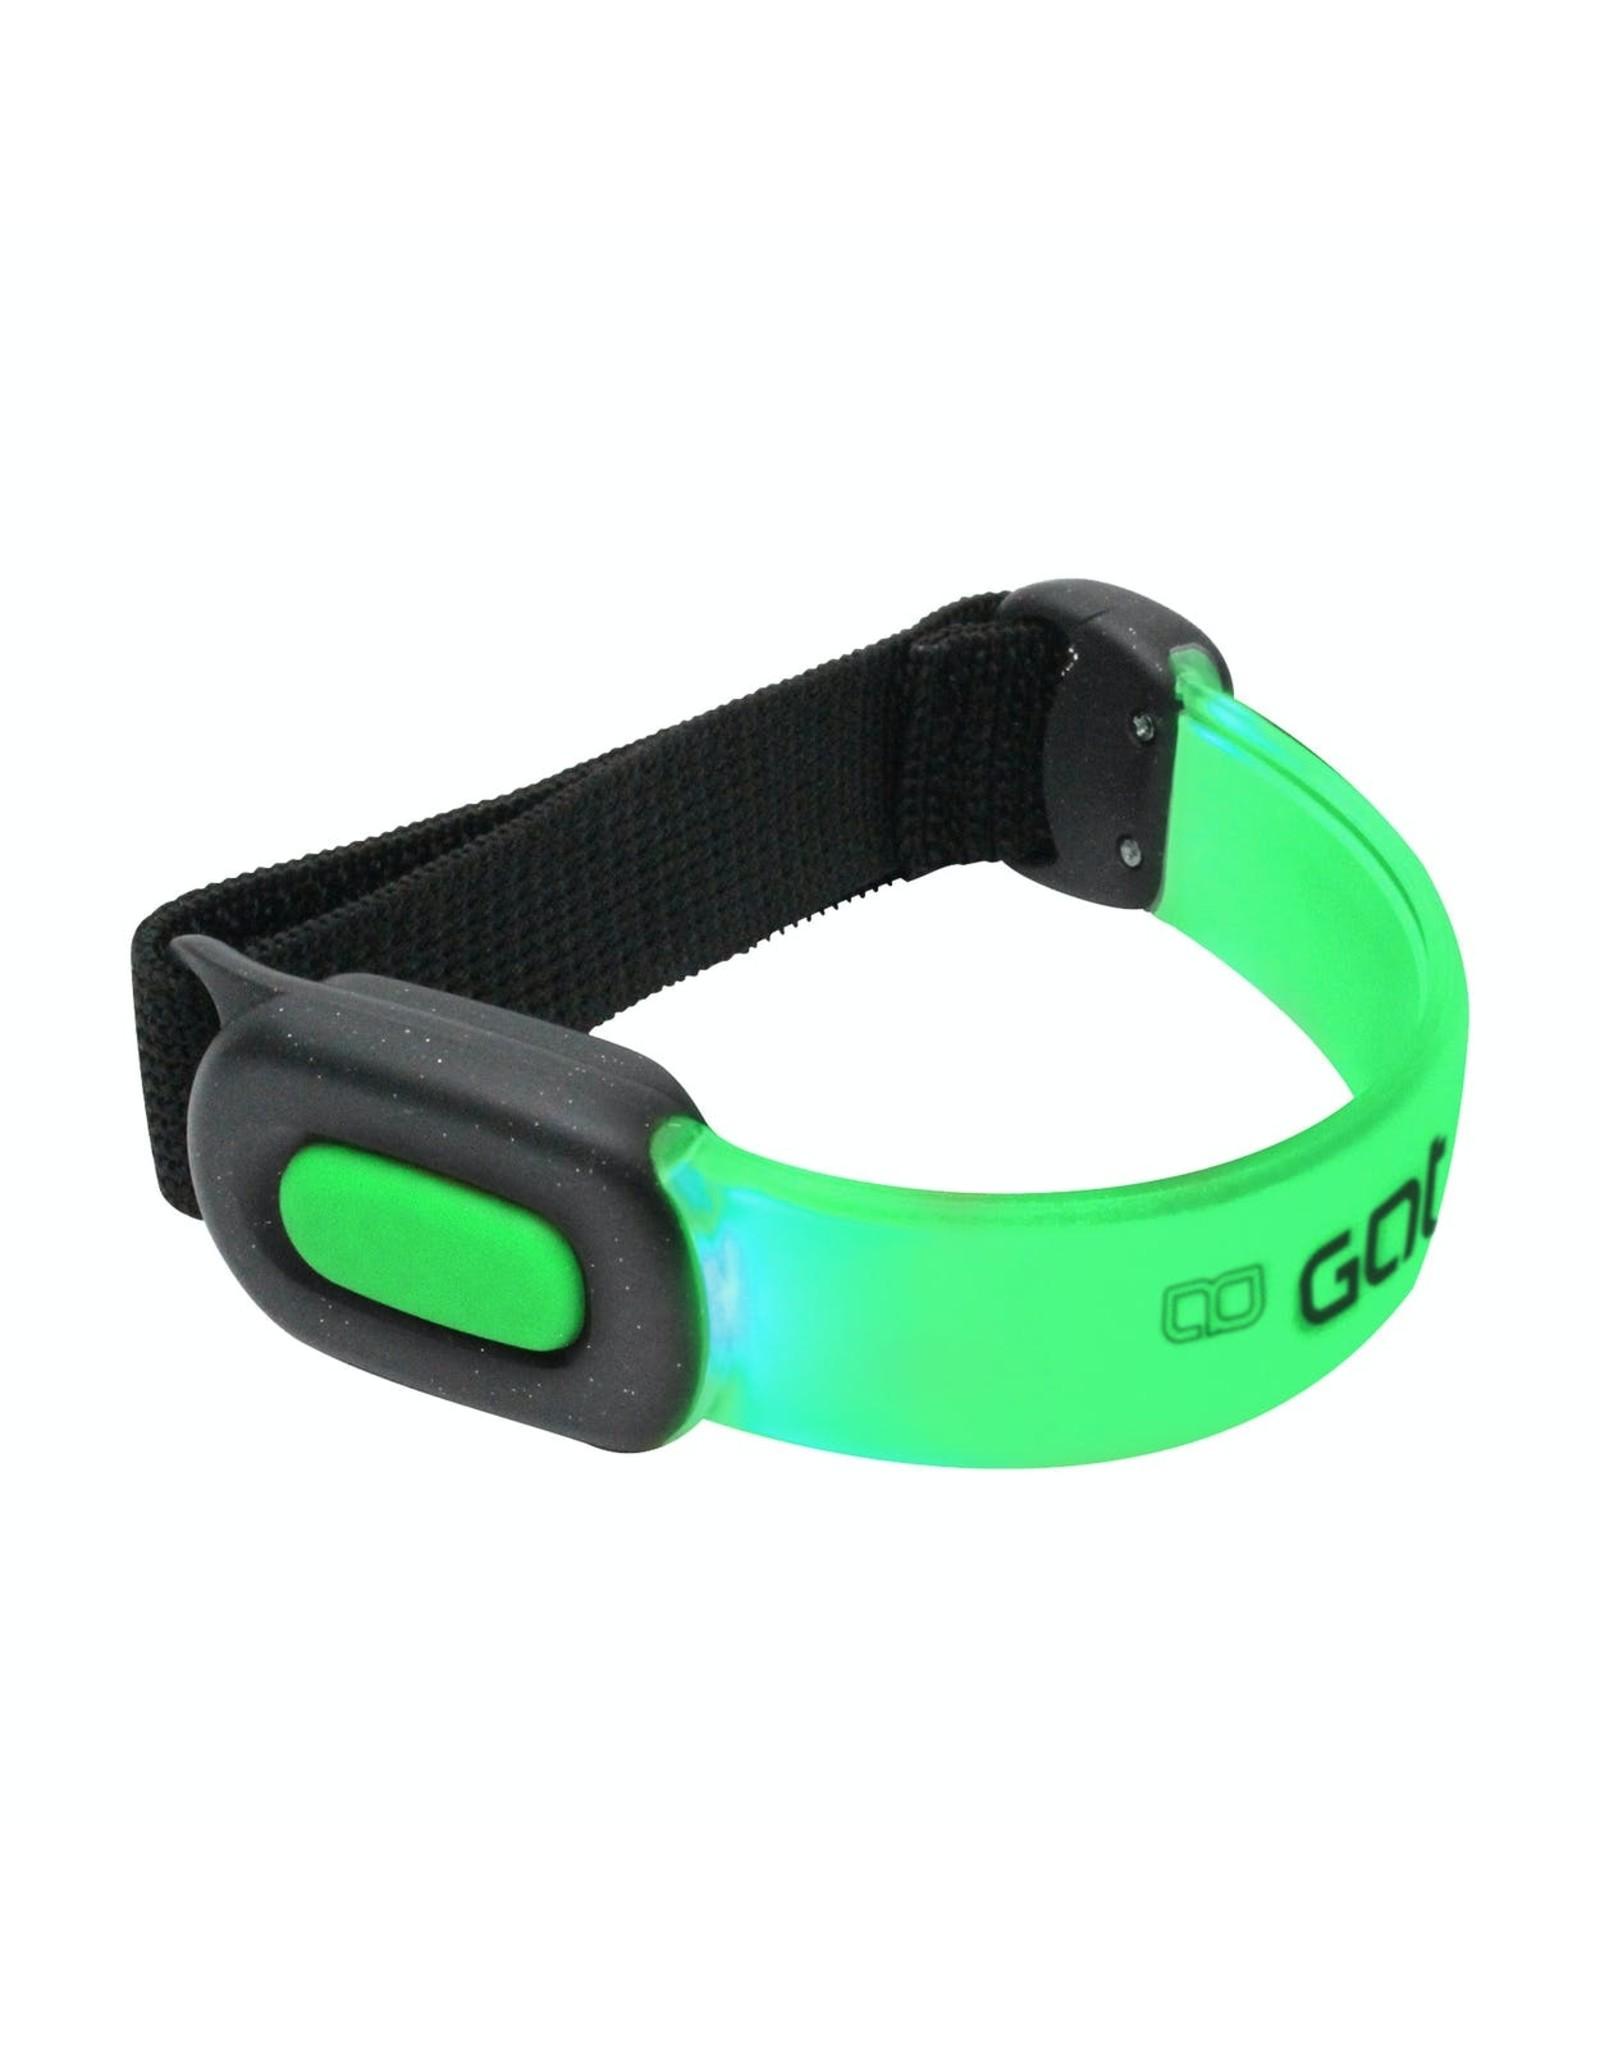 Gato USB NEON LED ARM LIGHT (Green)